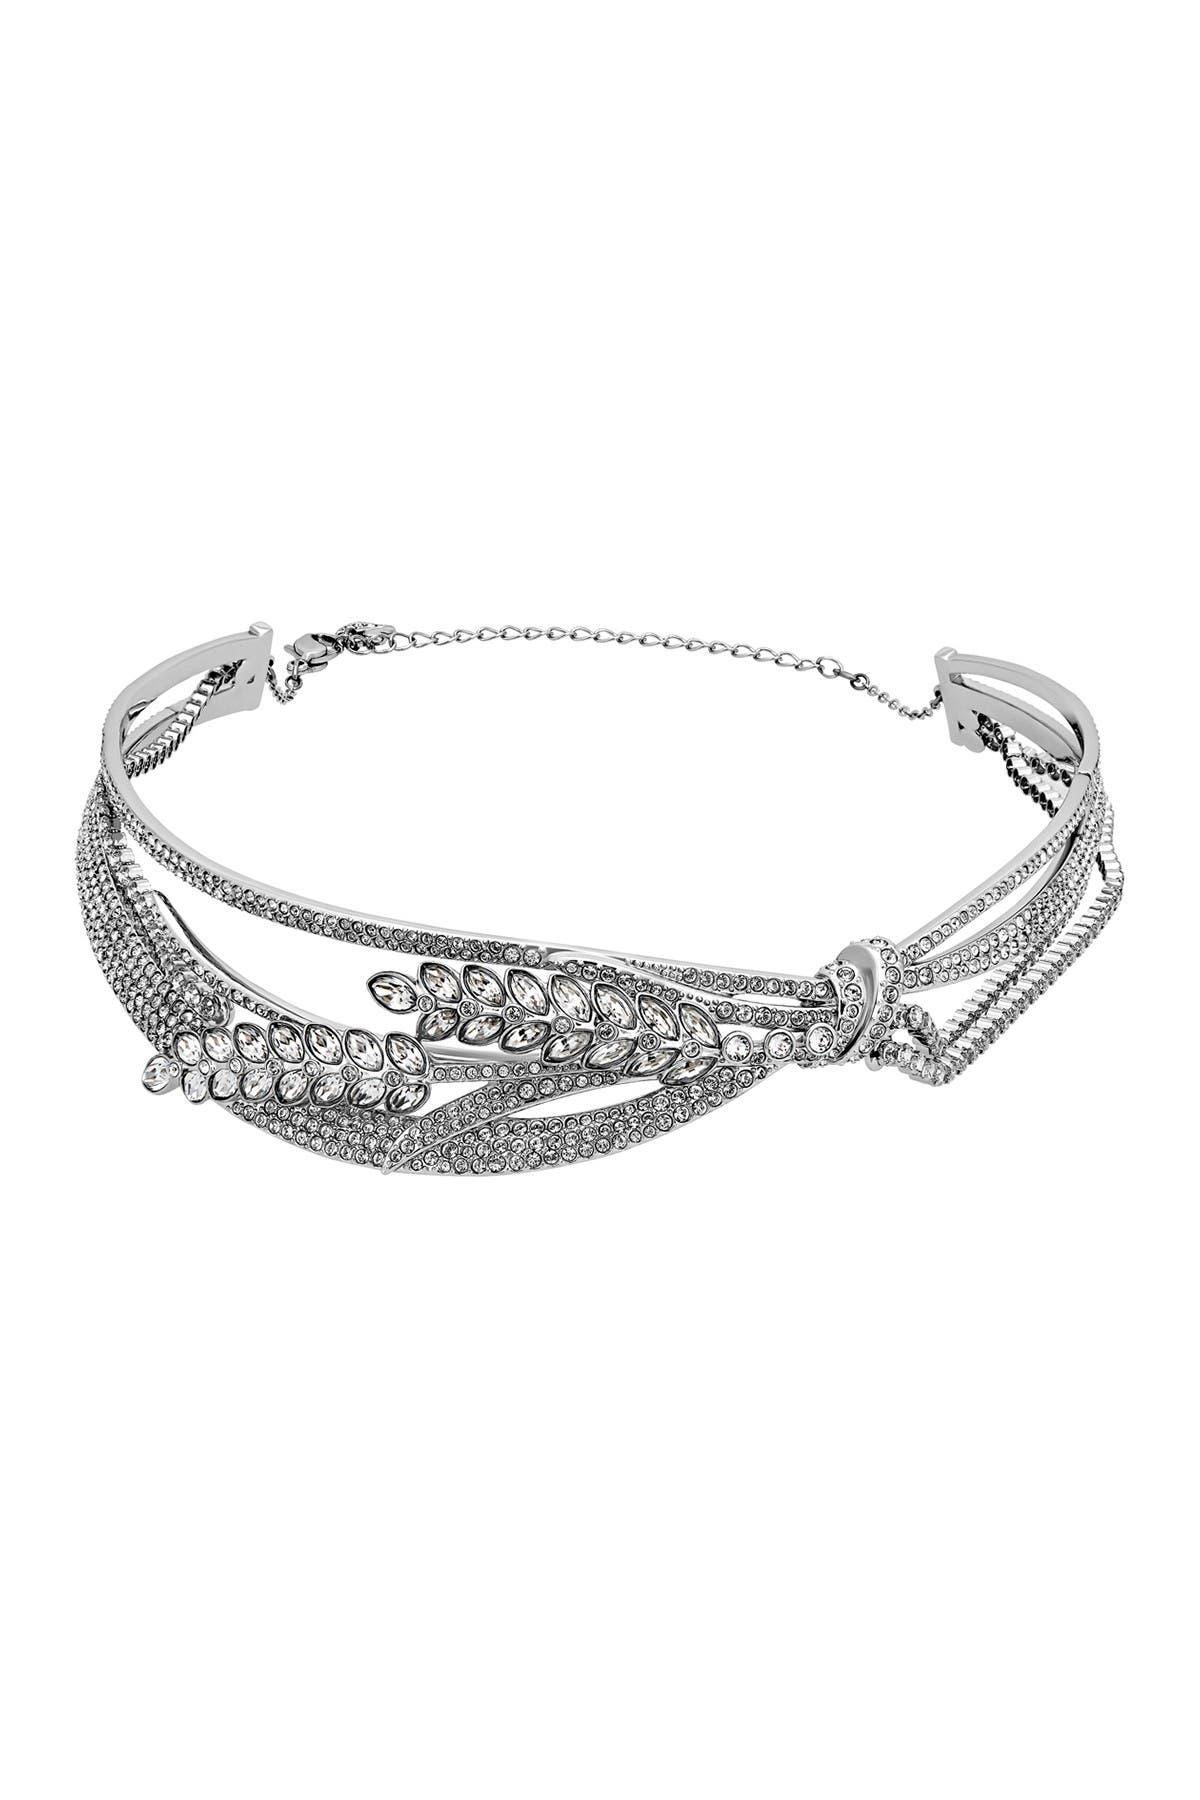 Image of Swarovski Lucia Pave Swarovski Crystal Choker Necklace